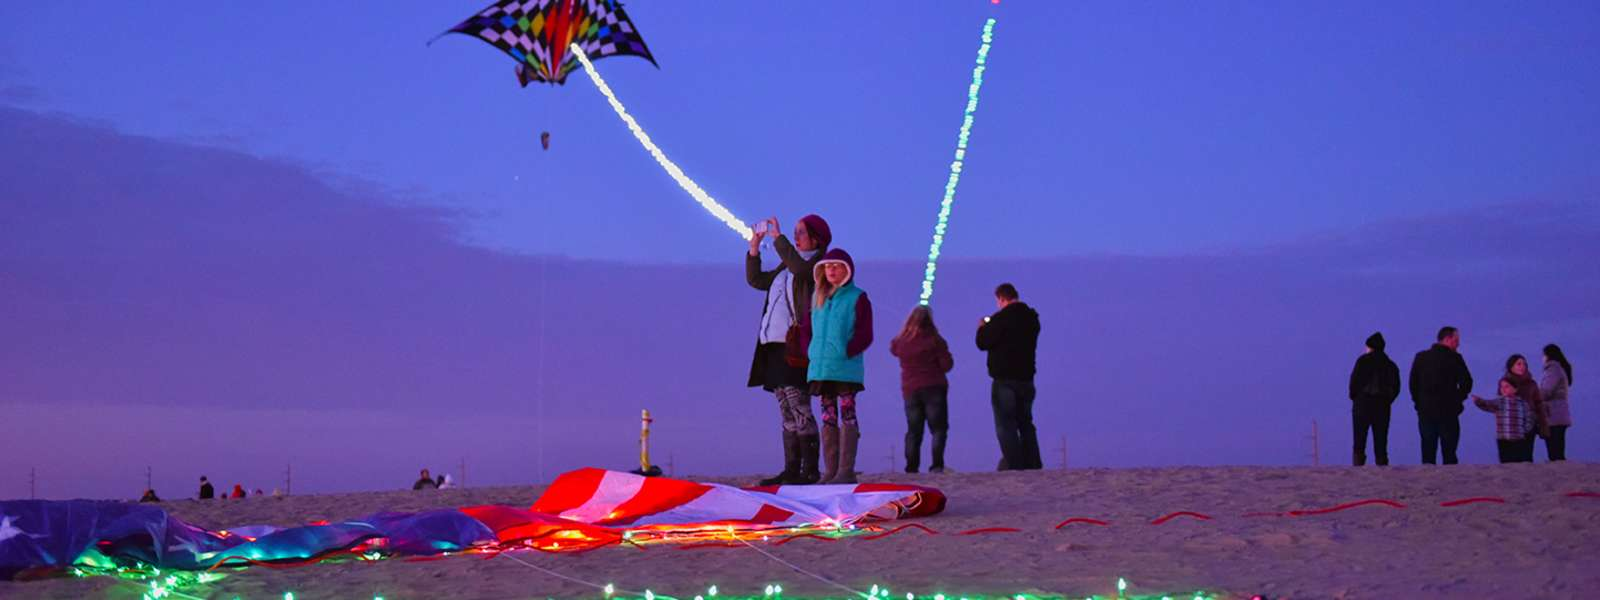 KitesWithLights_OuterBanksNC_4_90d46873-a9c0-4d07-9aae-db7caec5b936.jpg